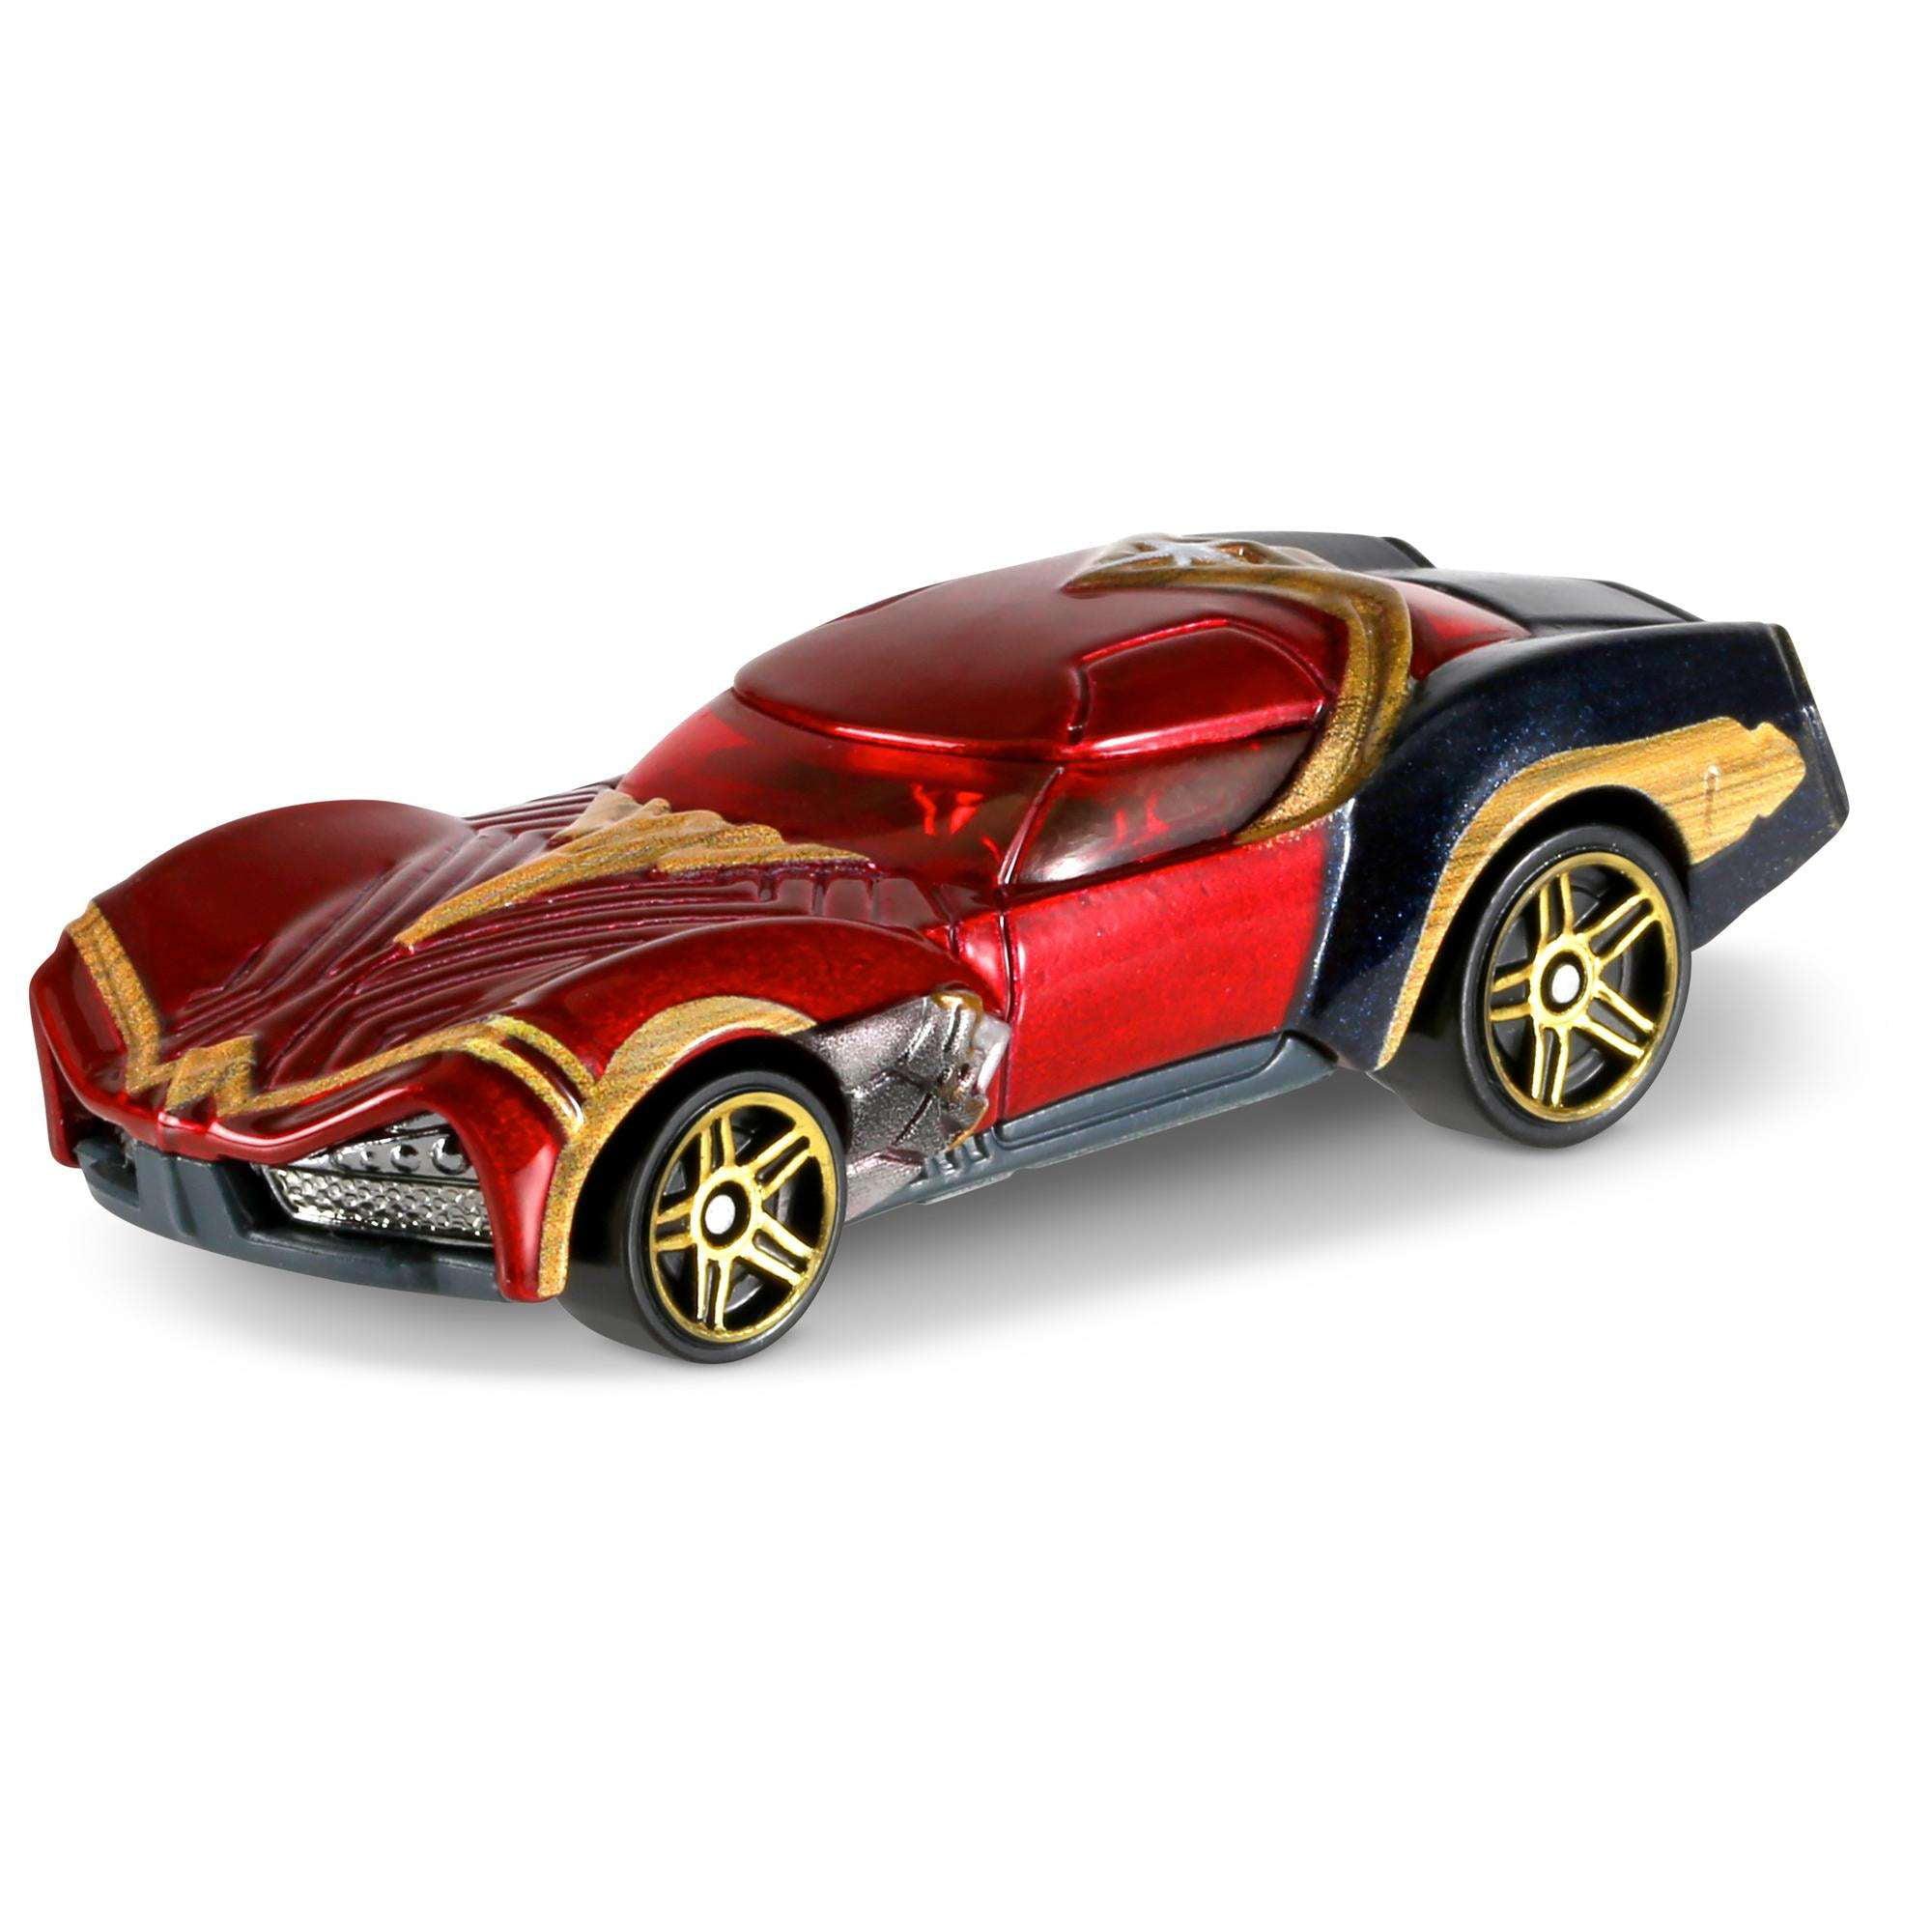 Hot Wheels DC Wonder Woman Car by Mattel